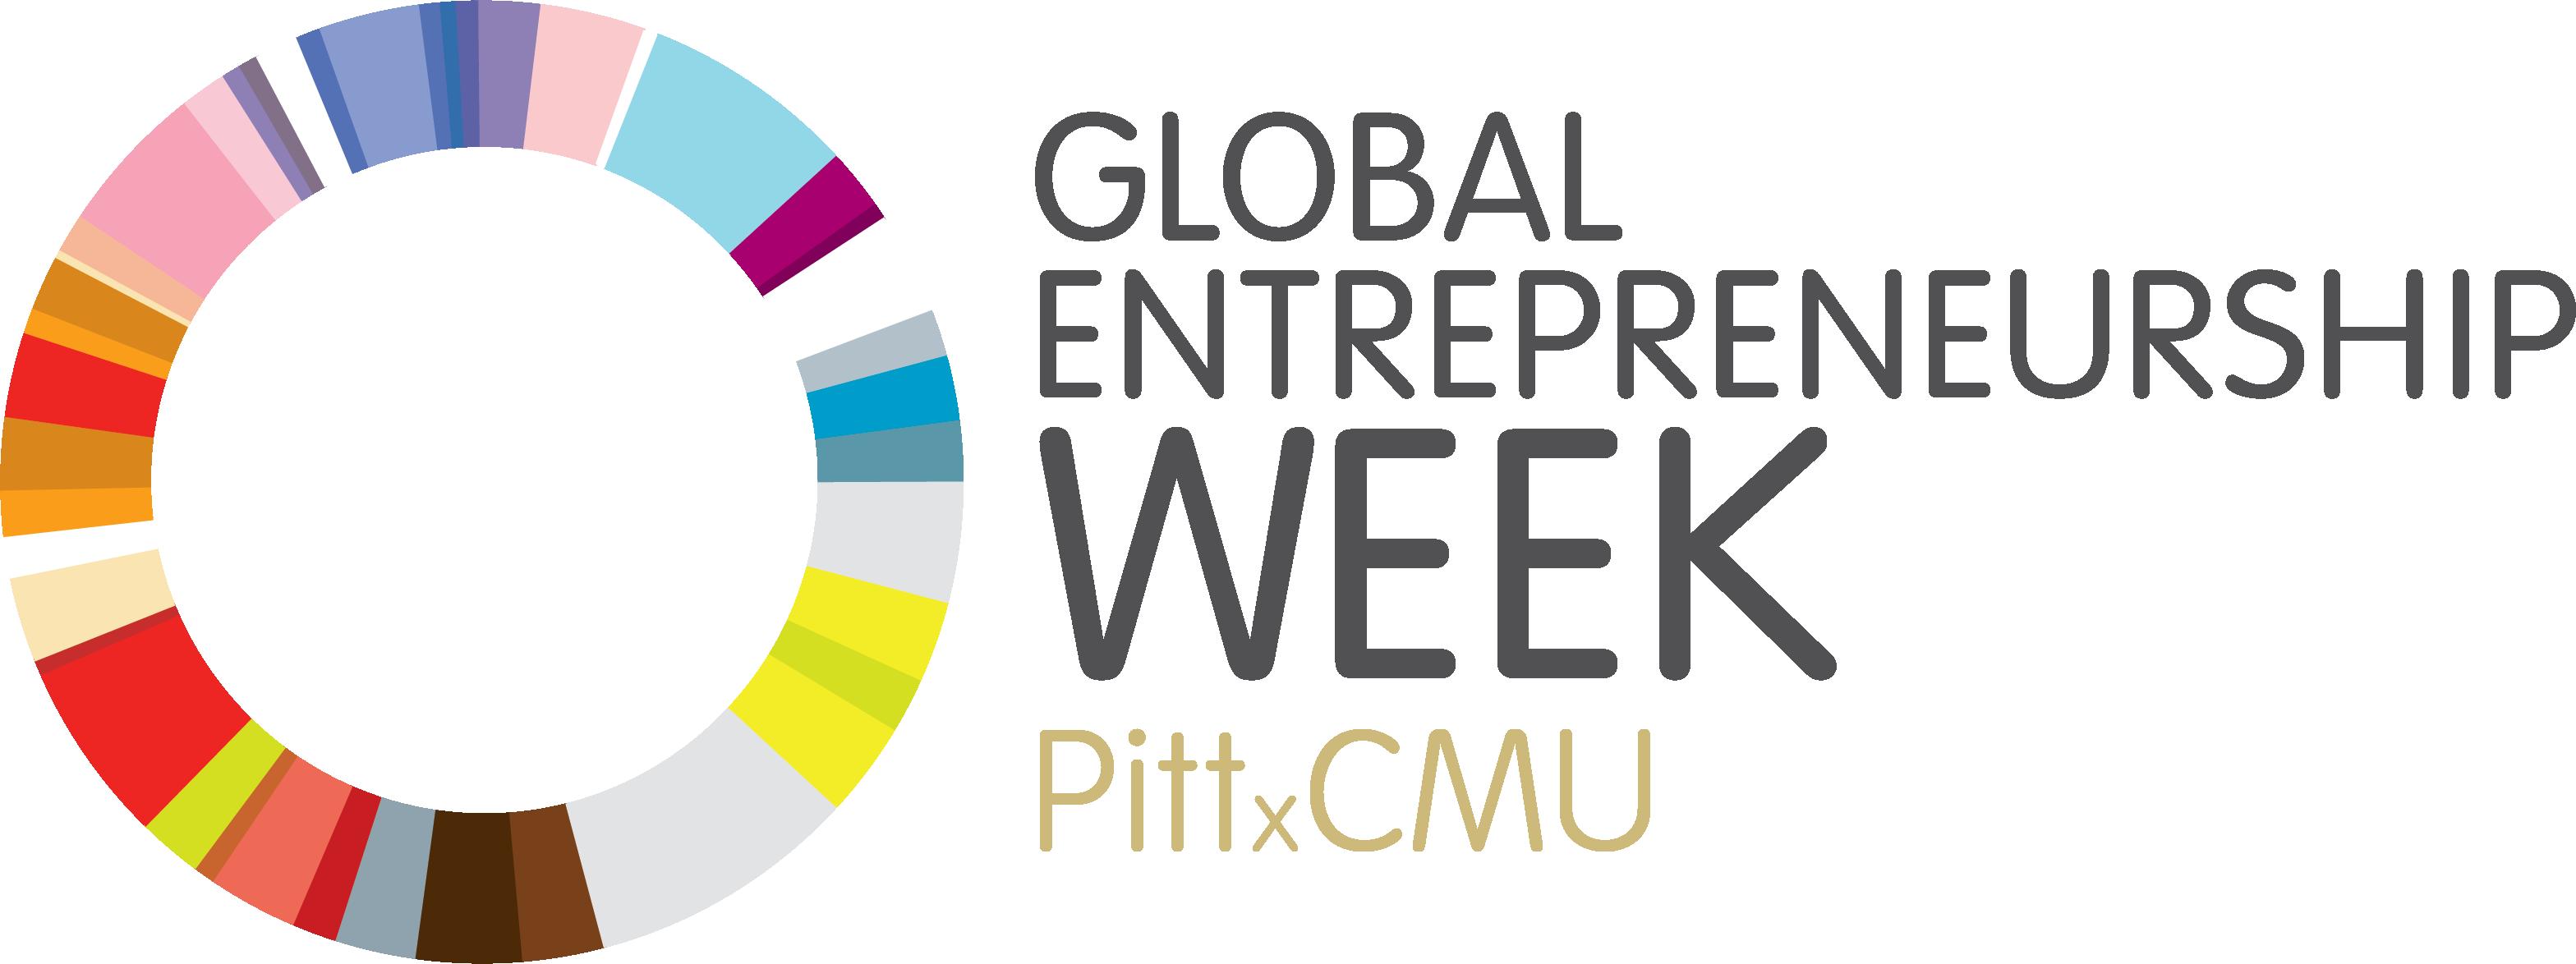 GE WEEK PittandCMU Logo - 1